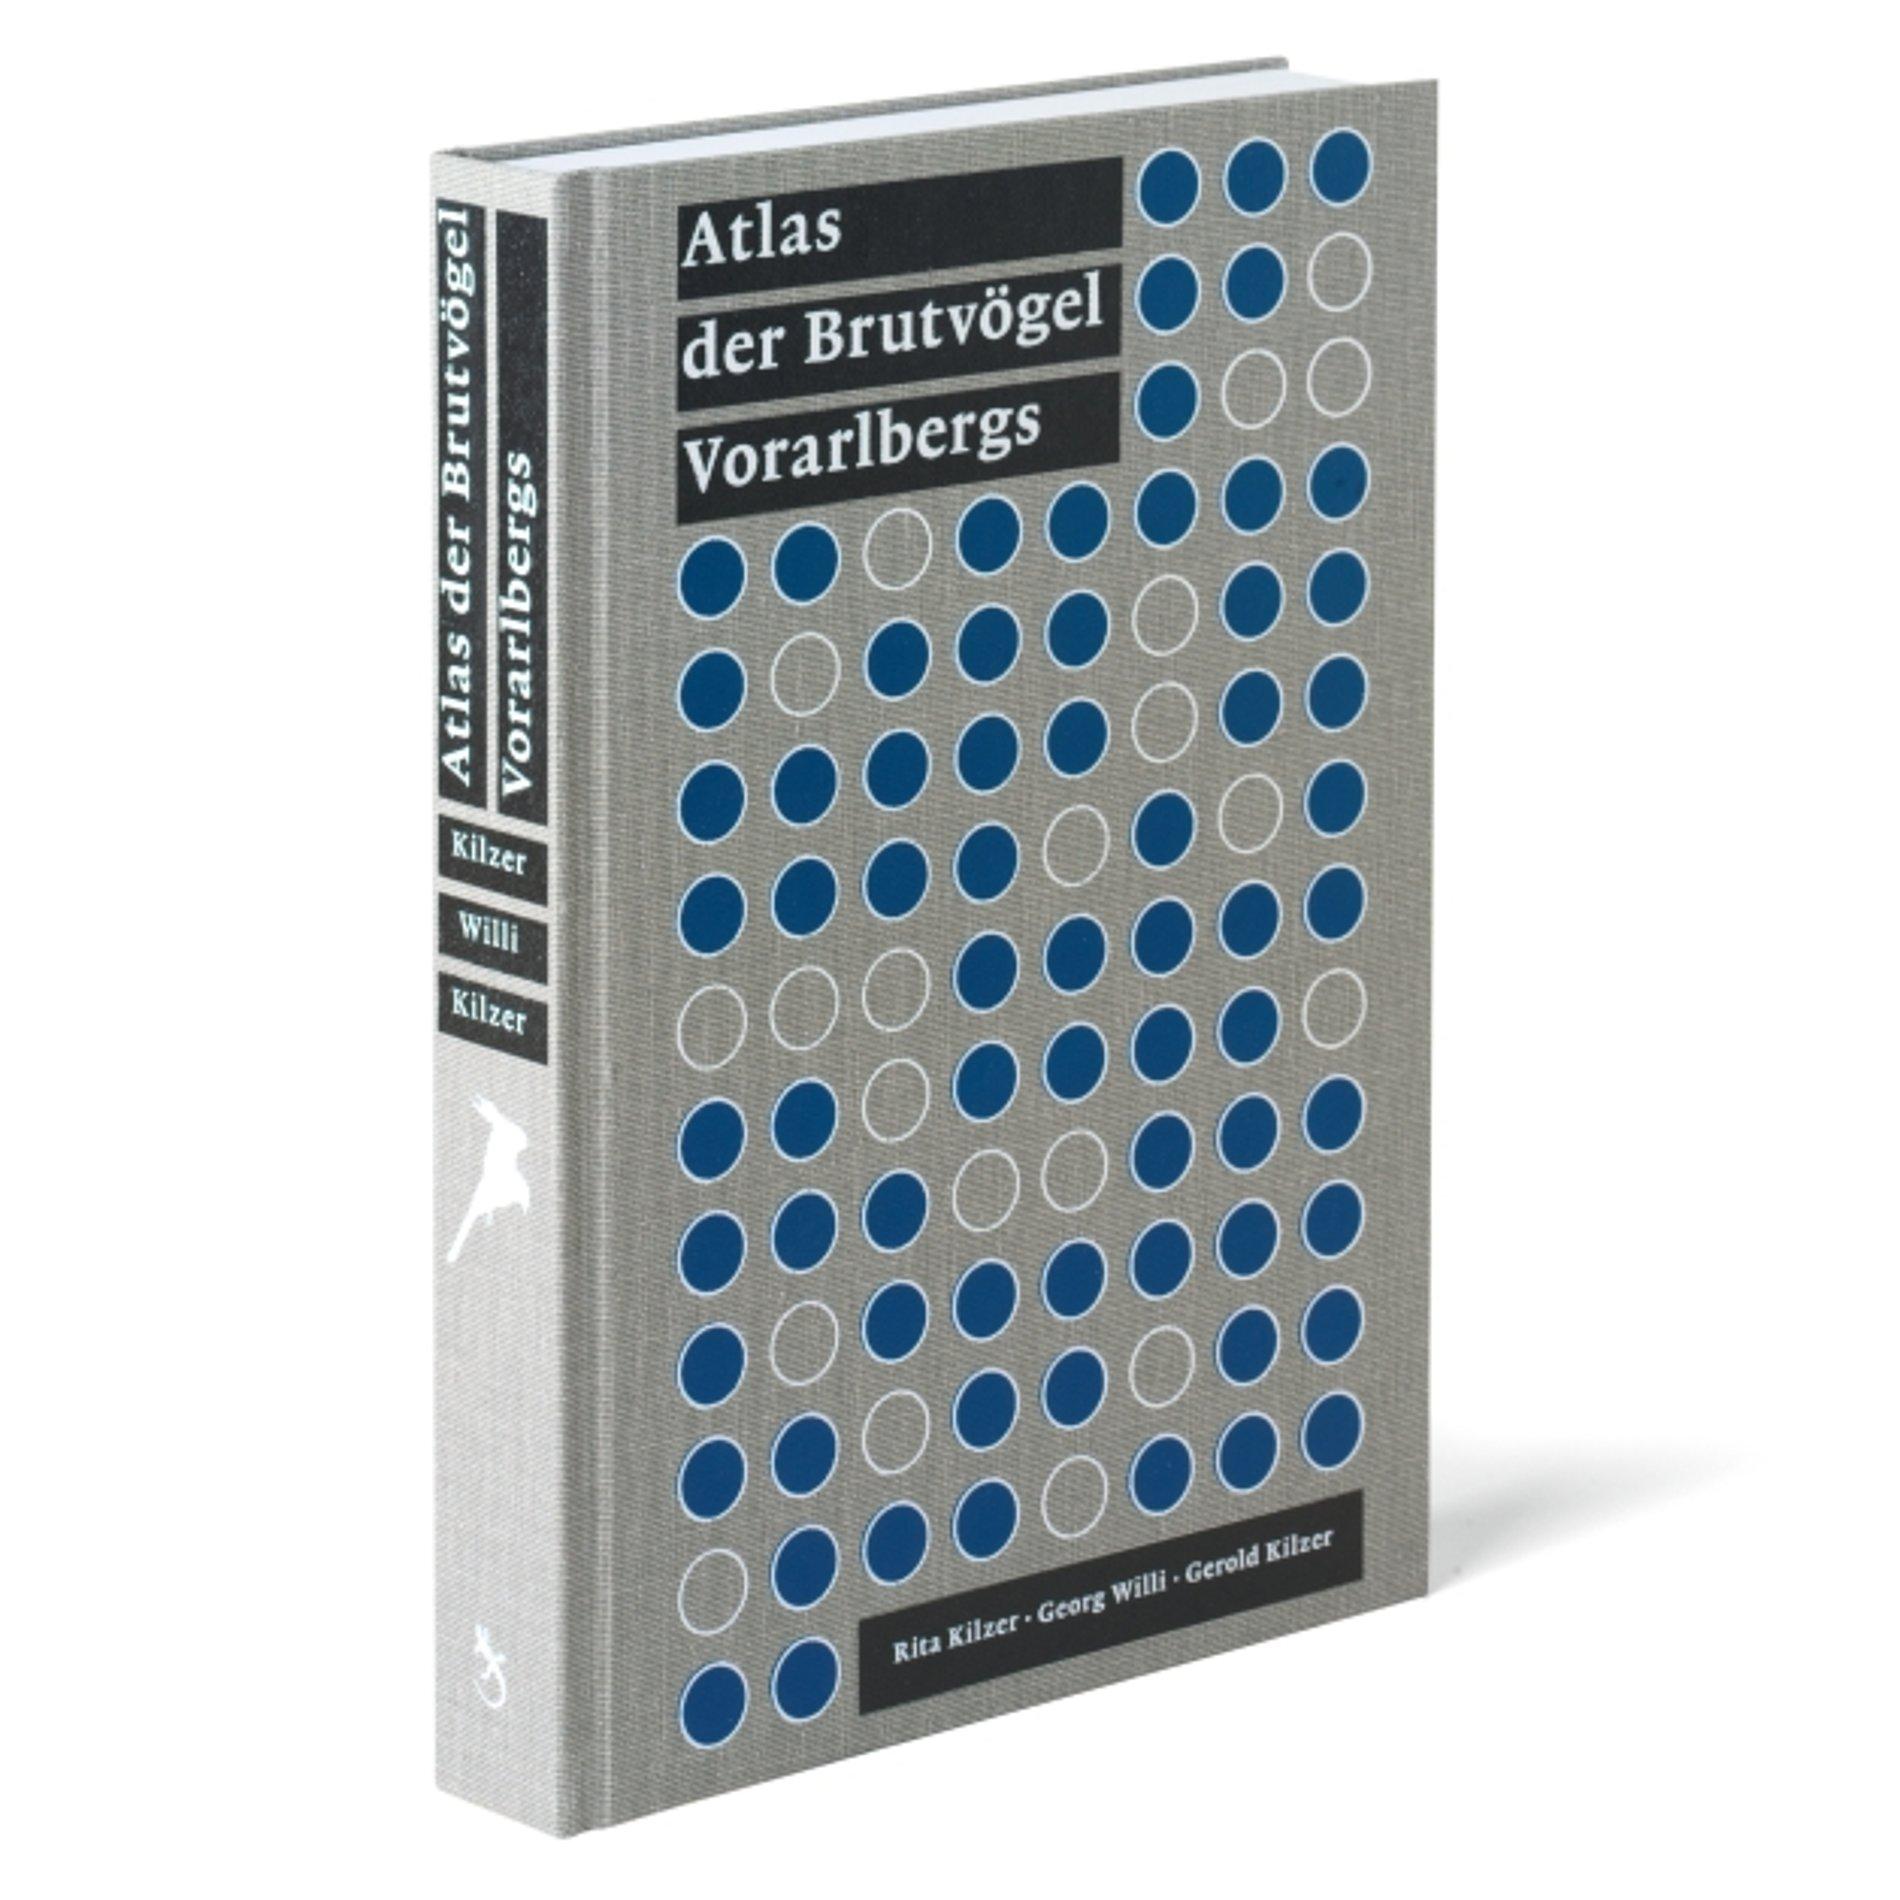 Atlas der Brutvögel Vorarlbergs | Red Dot Design Award